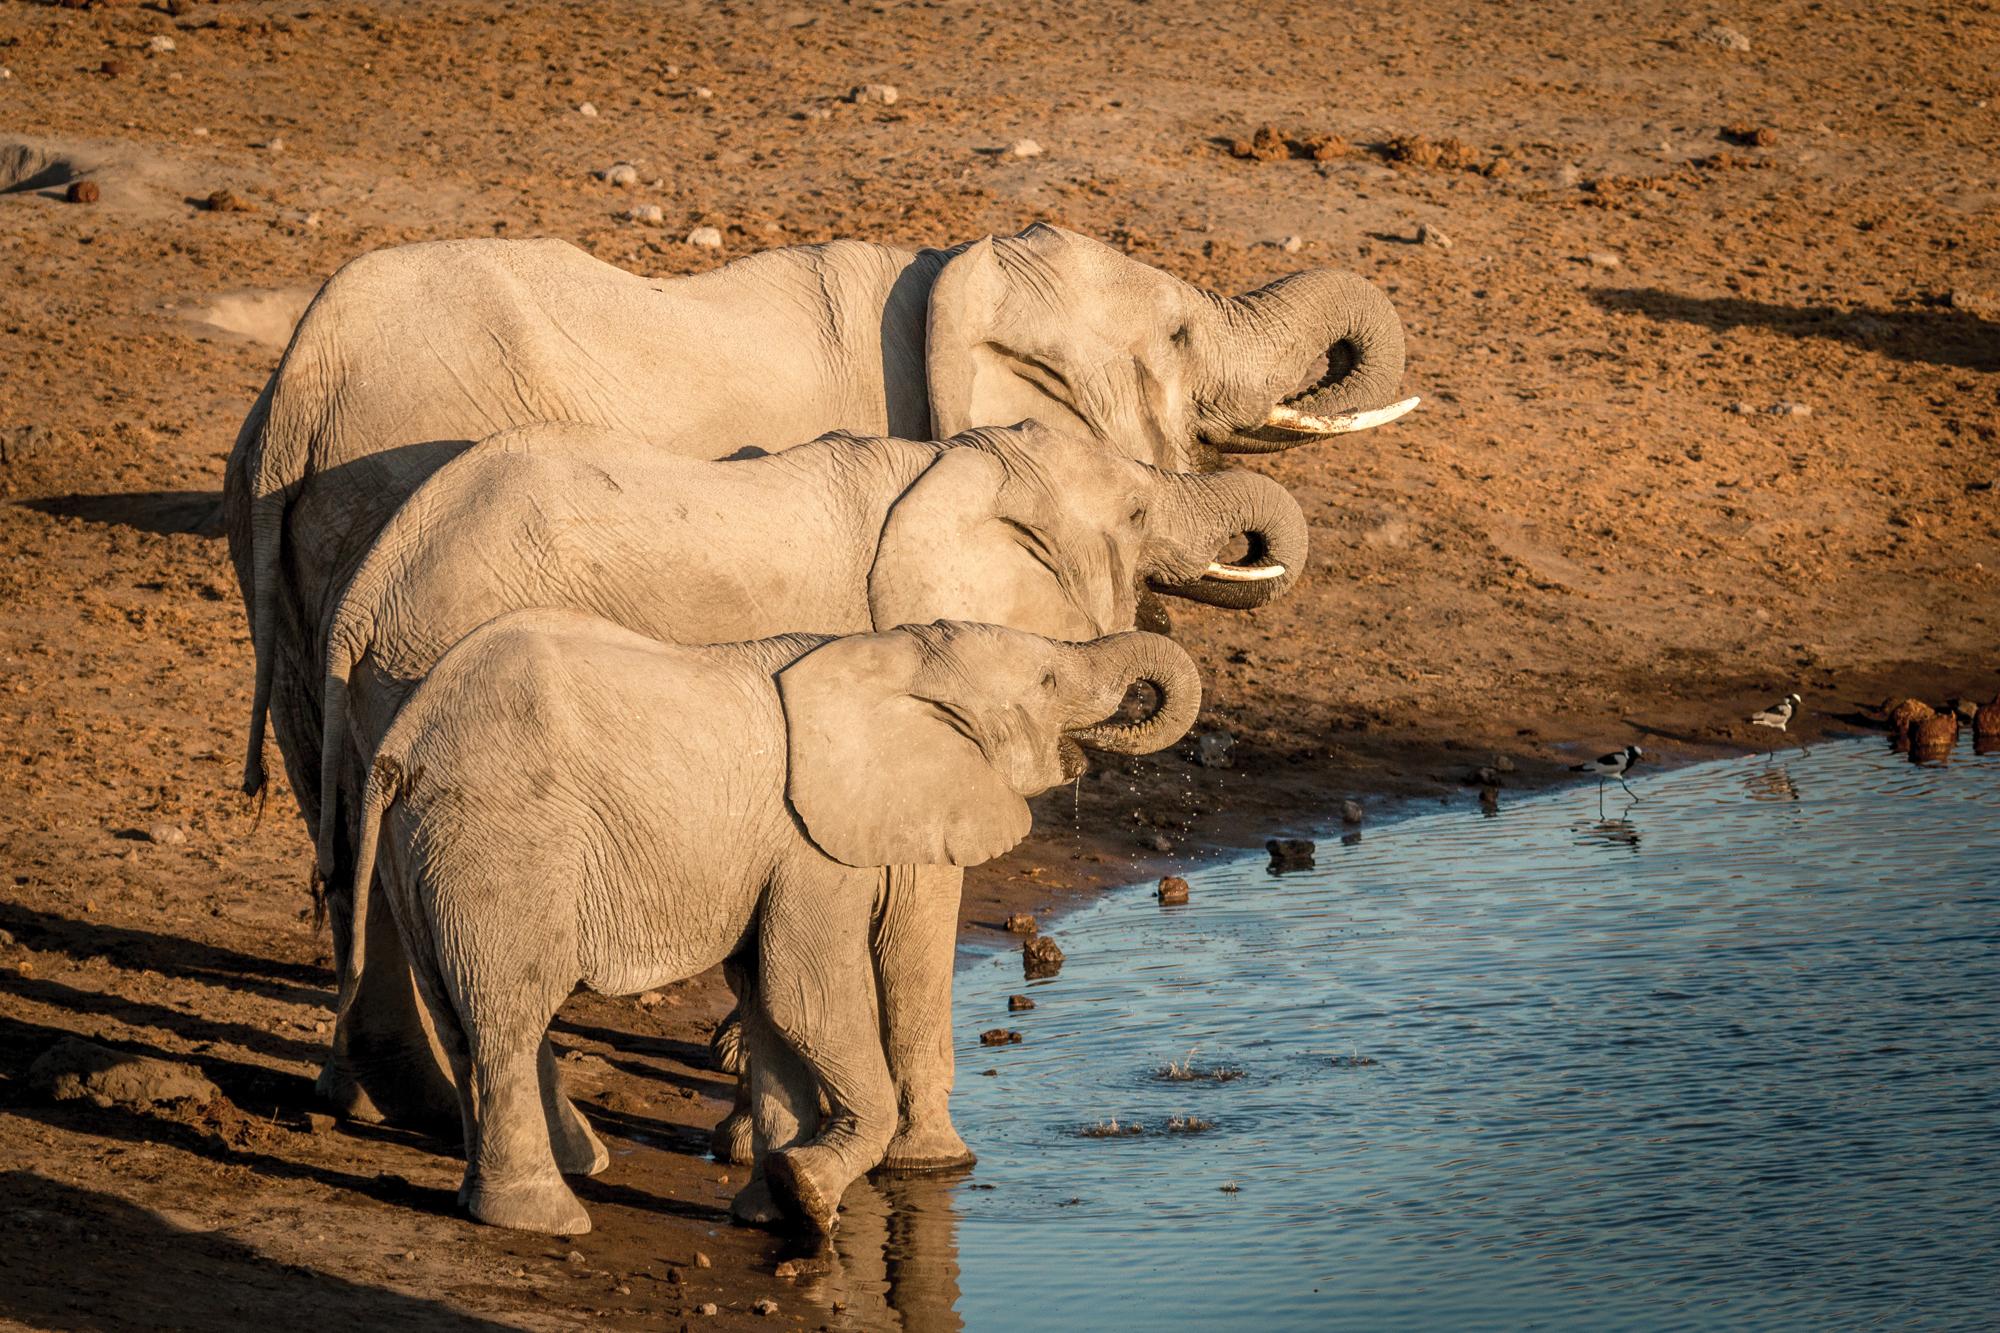 12.-Elephants-Drinking-Chudop